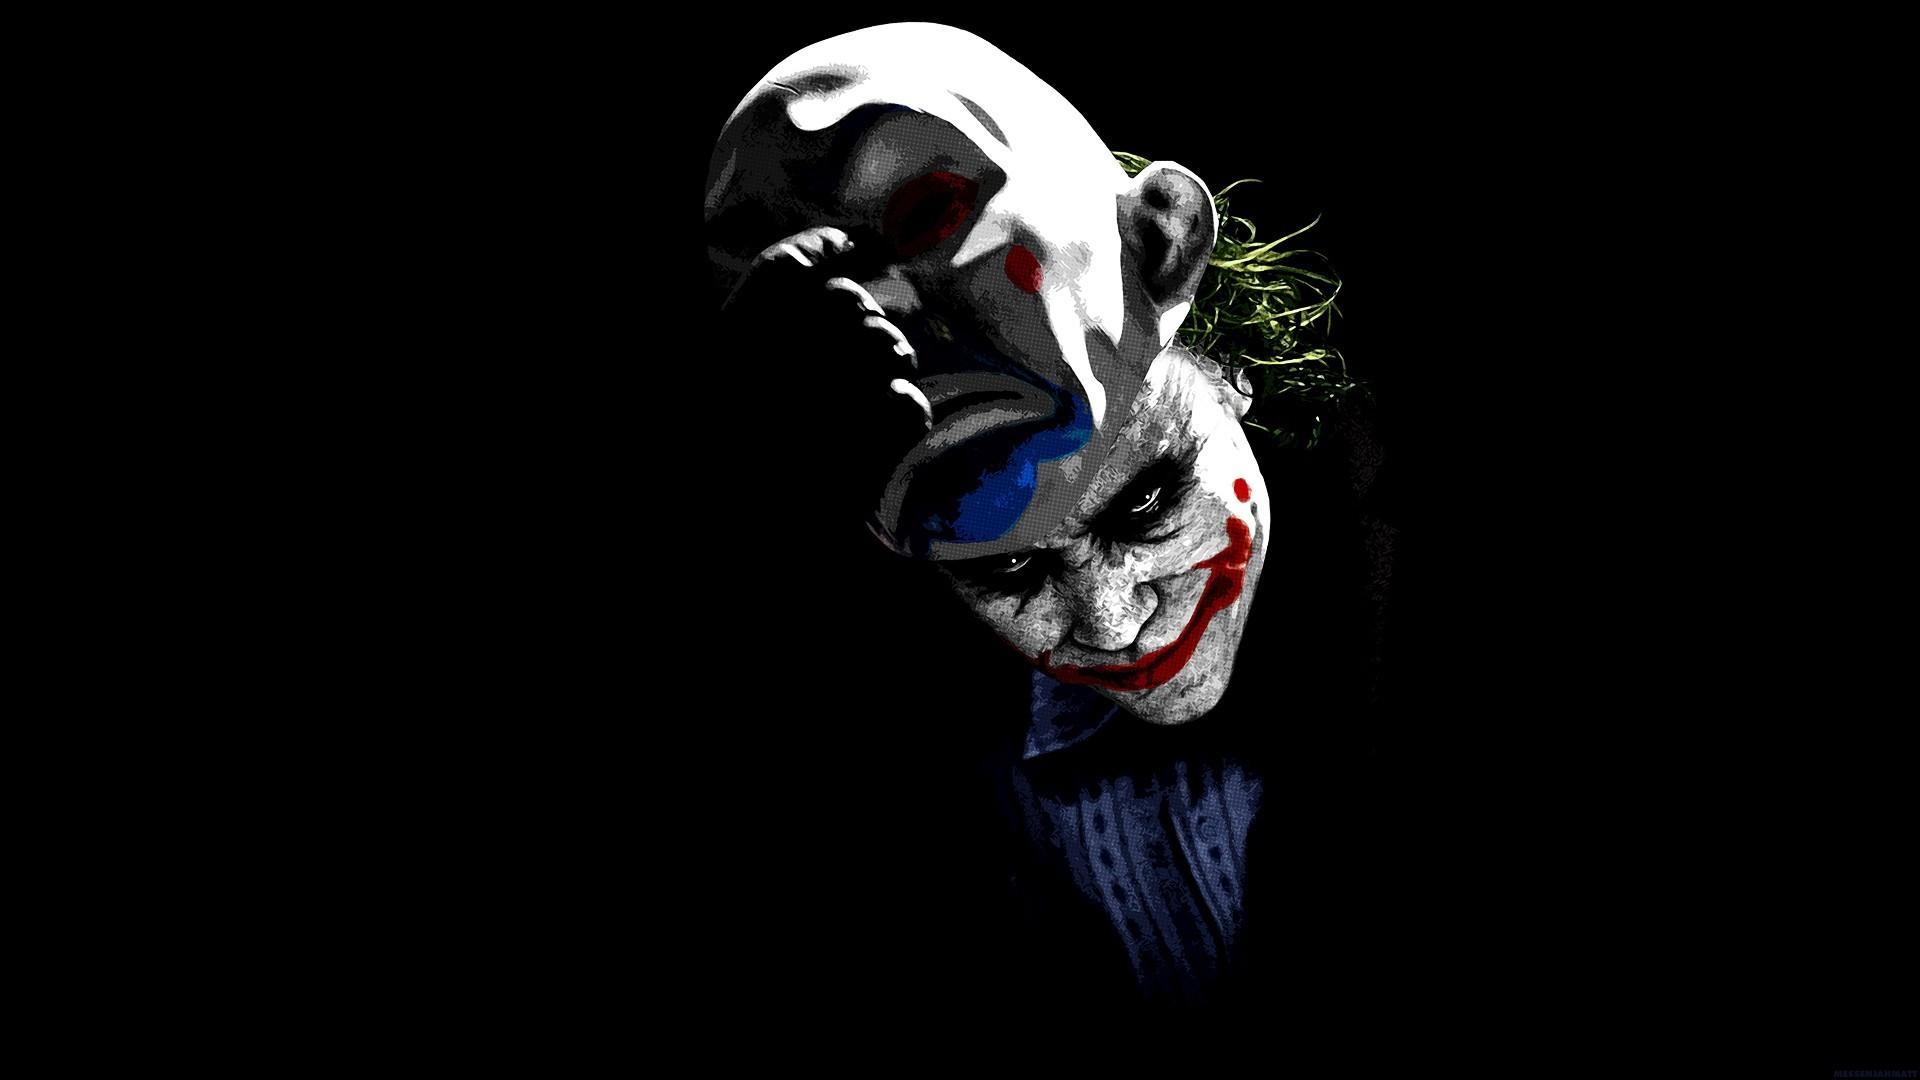 1920x1080 0 The Joker Wallpapers | WallpaperSafari joker wallpapers WallpaperUP